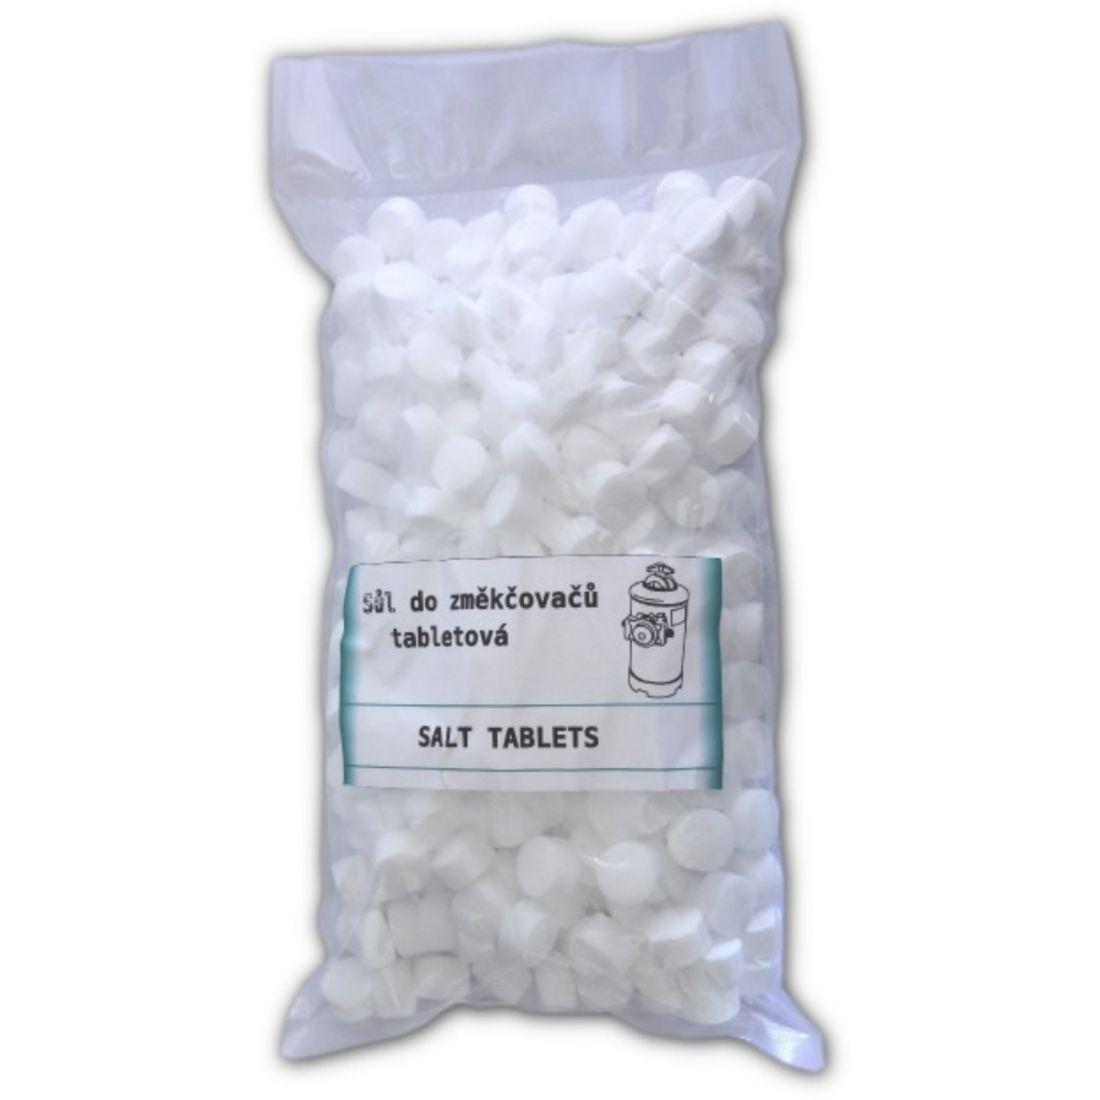 UWIS salt tablets 25 kg